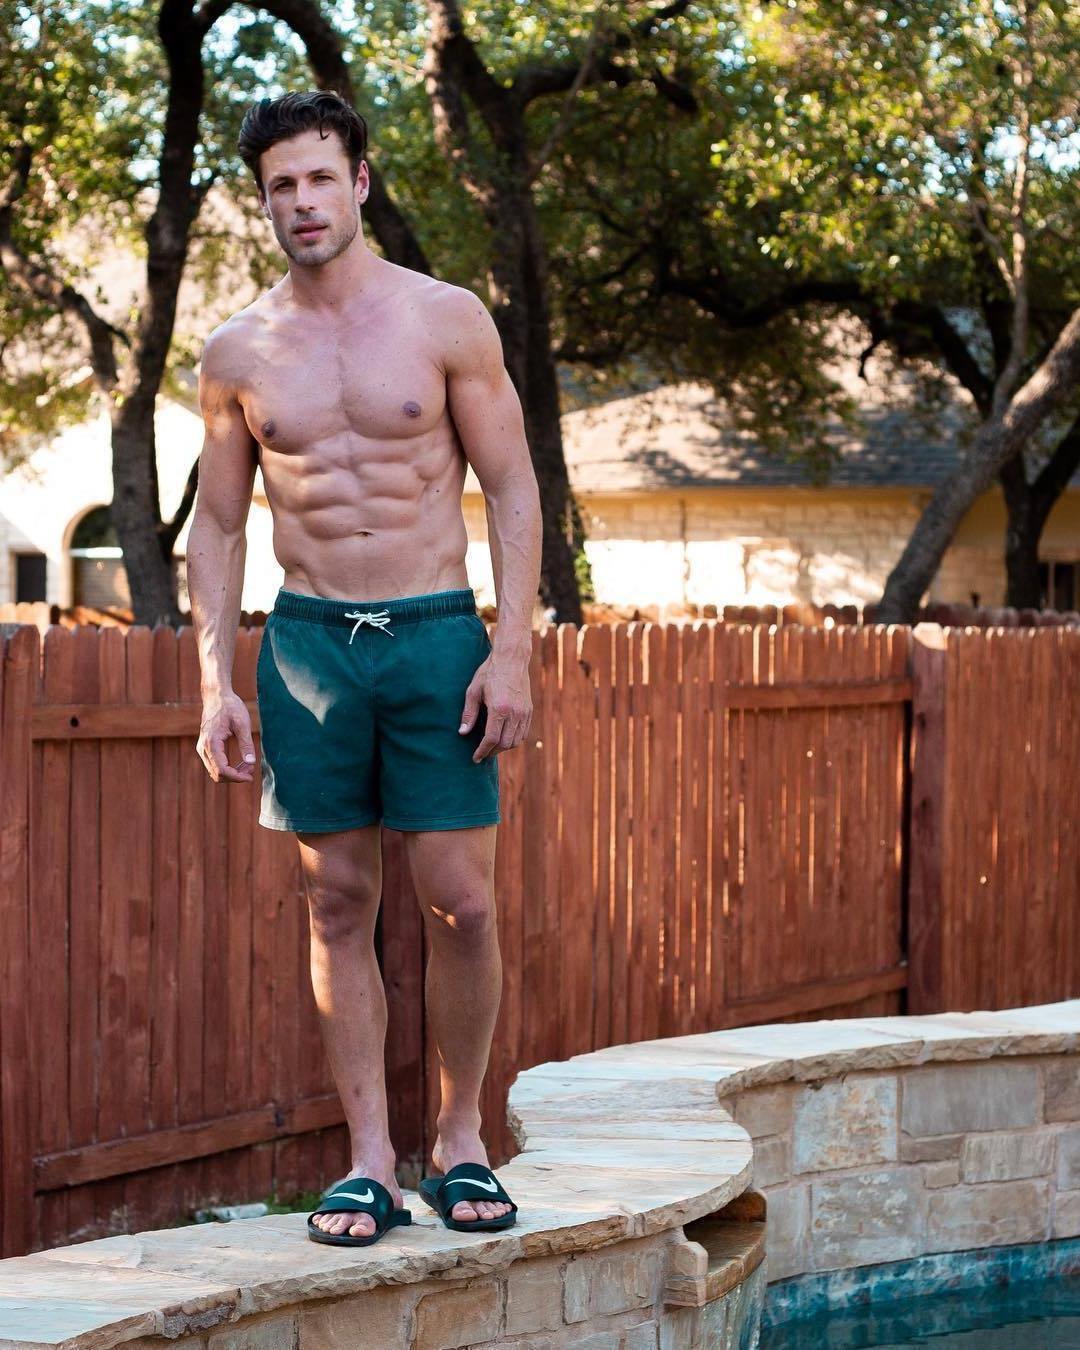 handsome-shirtless-man-big-pecs-ripped-abs-green-shorts